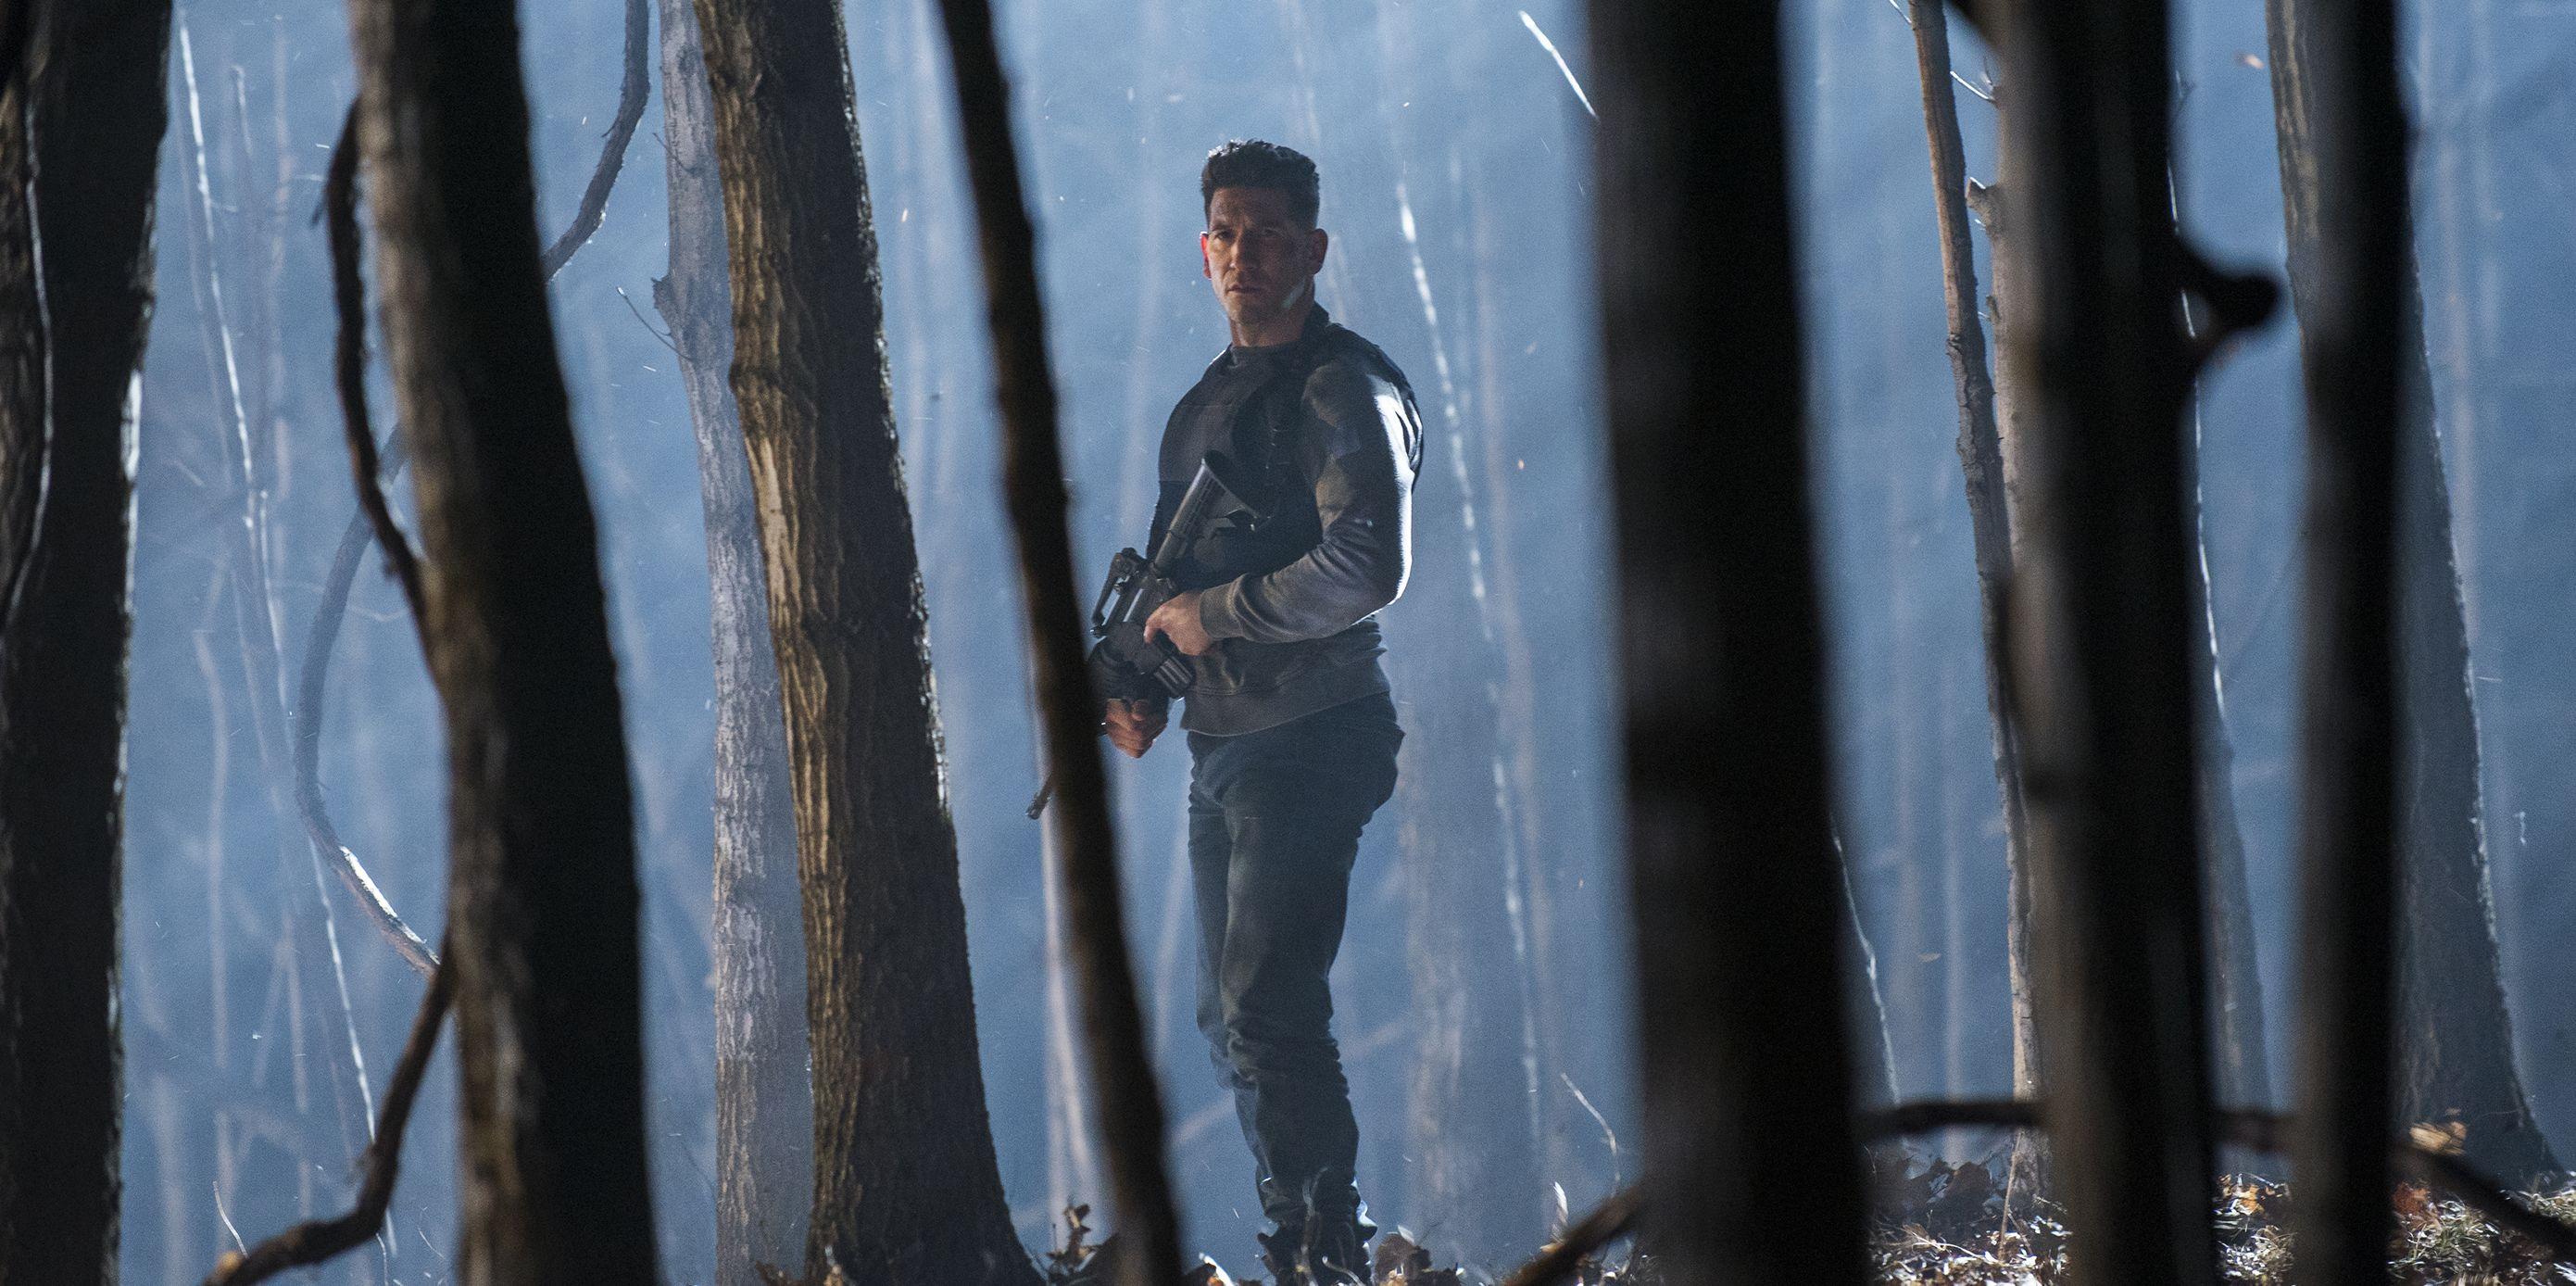 The Punisher season 2, Jon Bernthal as Frank Castle